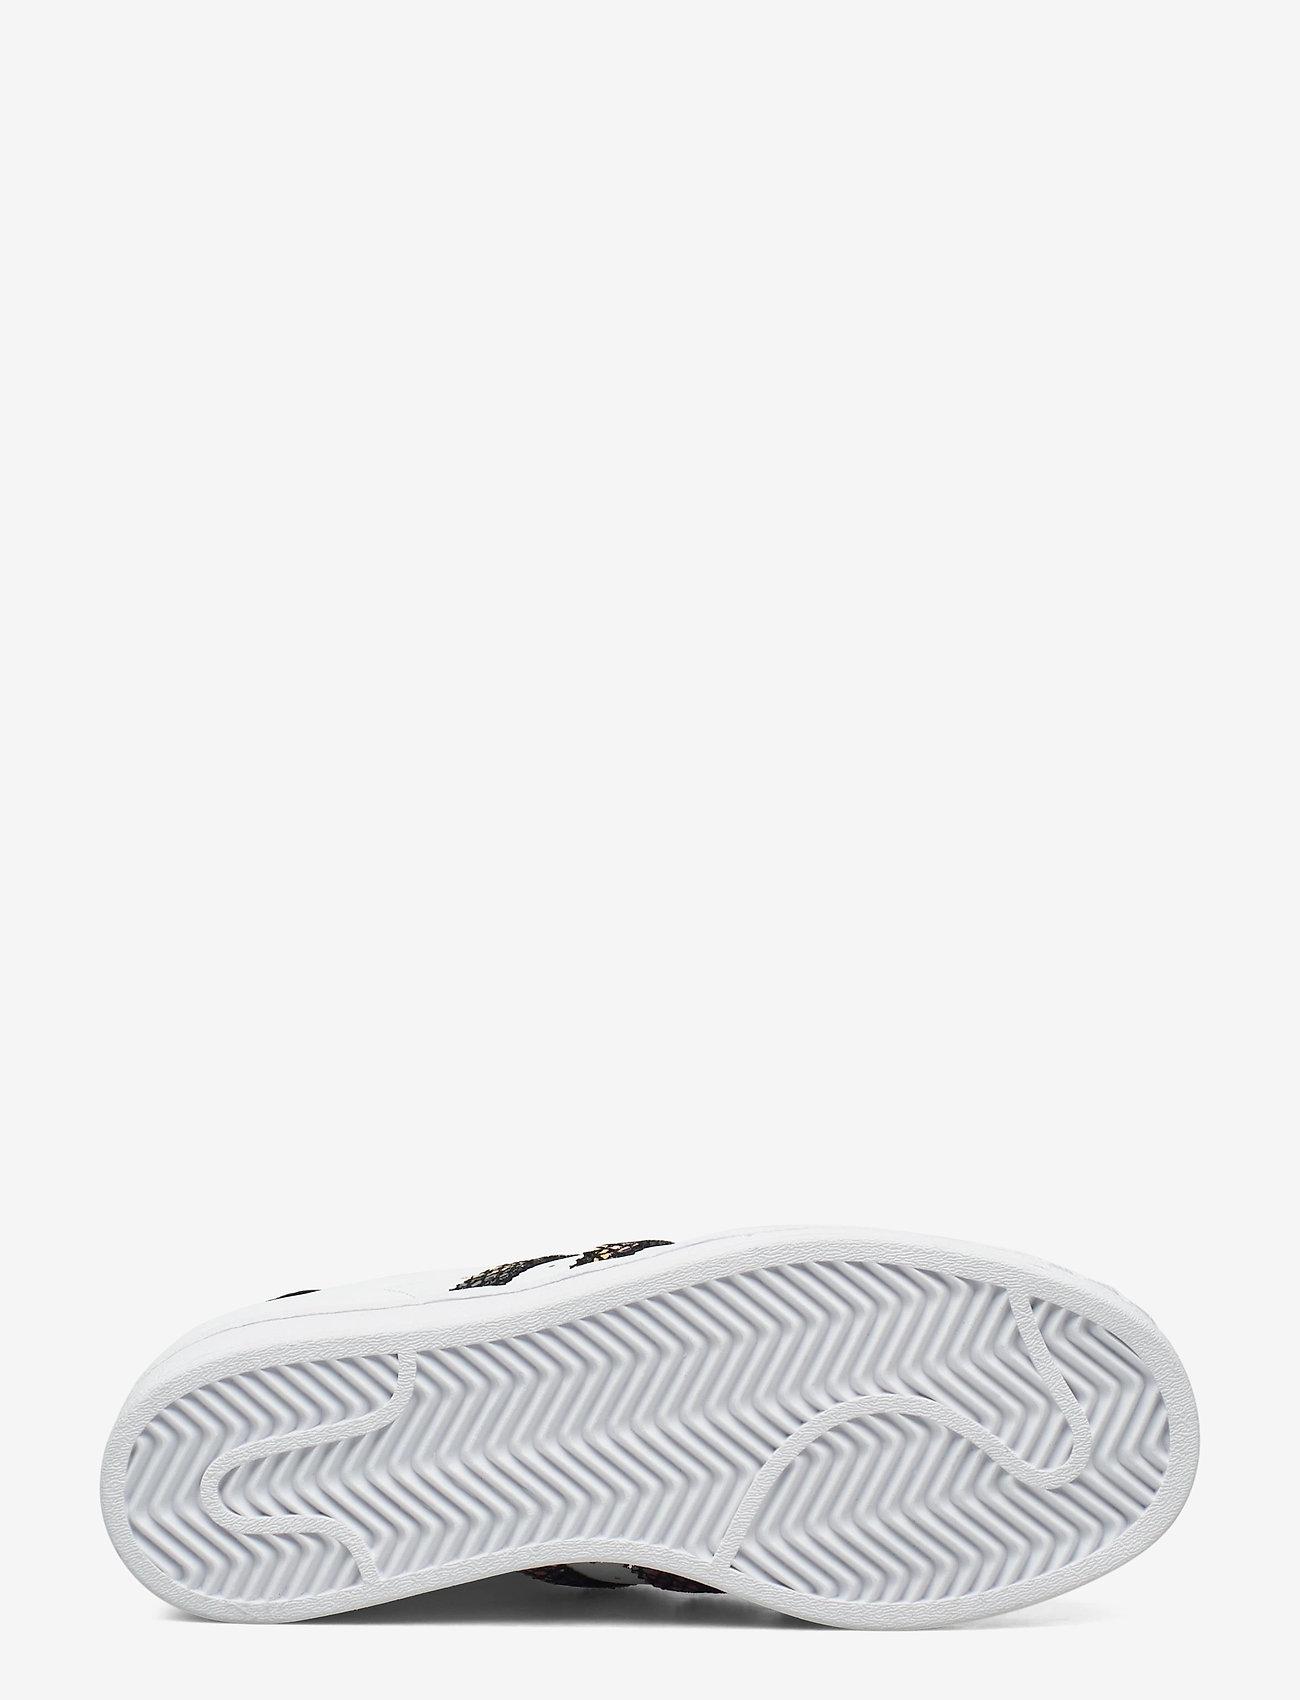 adidas Originals - SUPERSTAR W - låga sneakers - ftwwht/cblack/red - 4